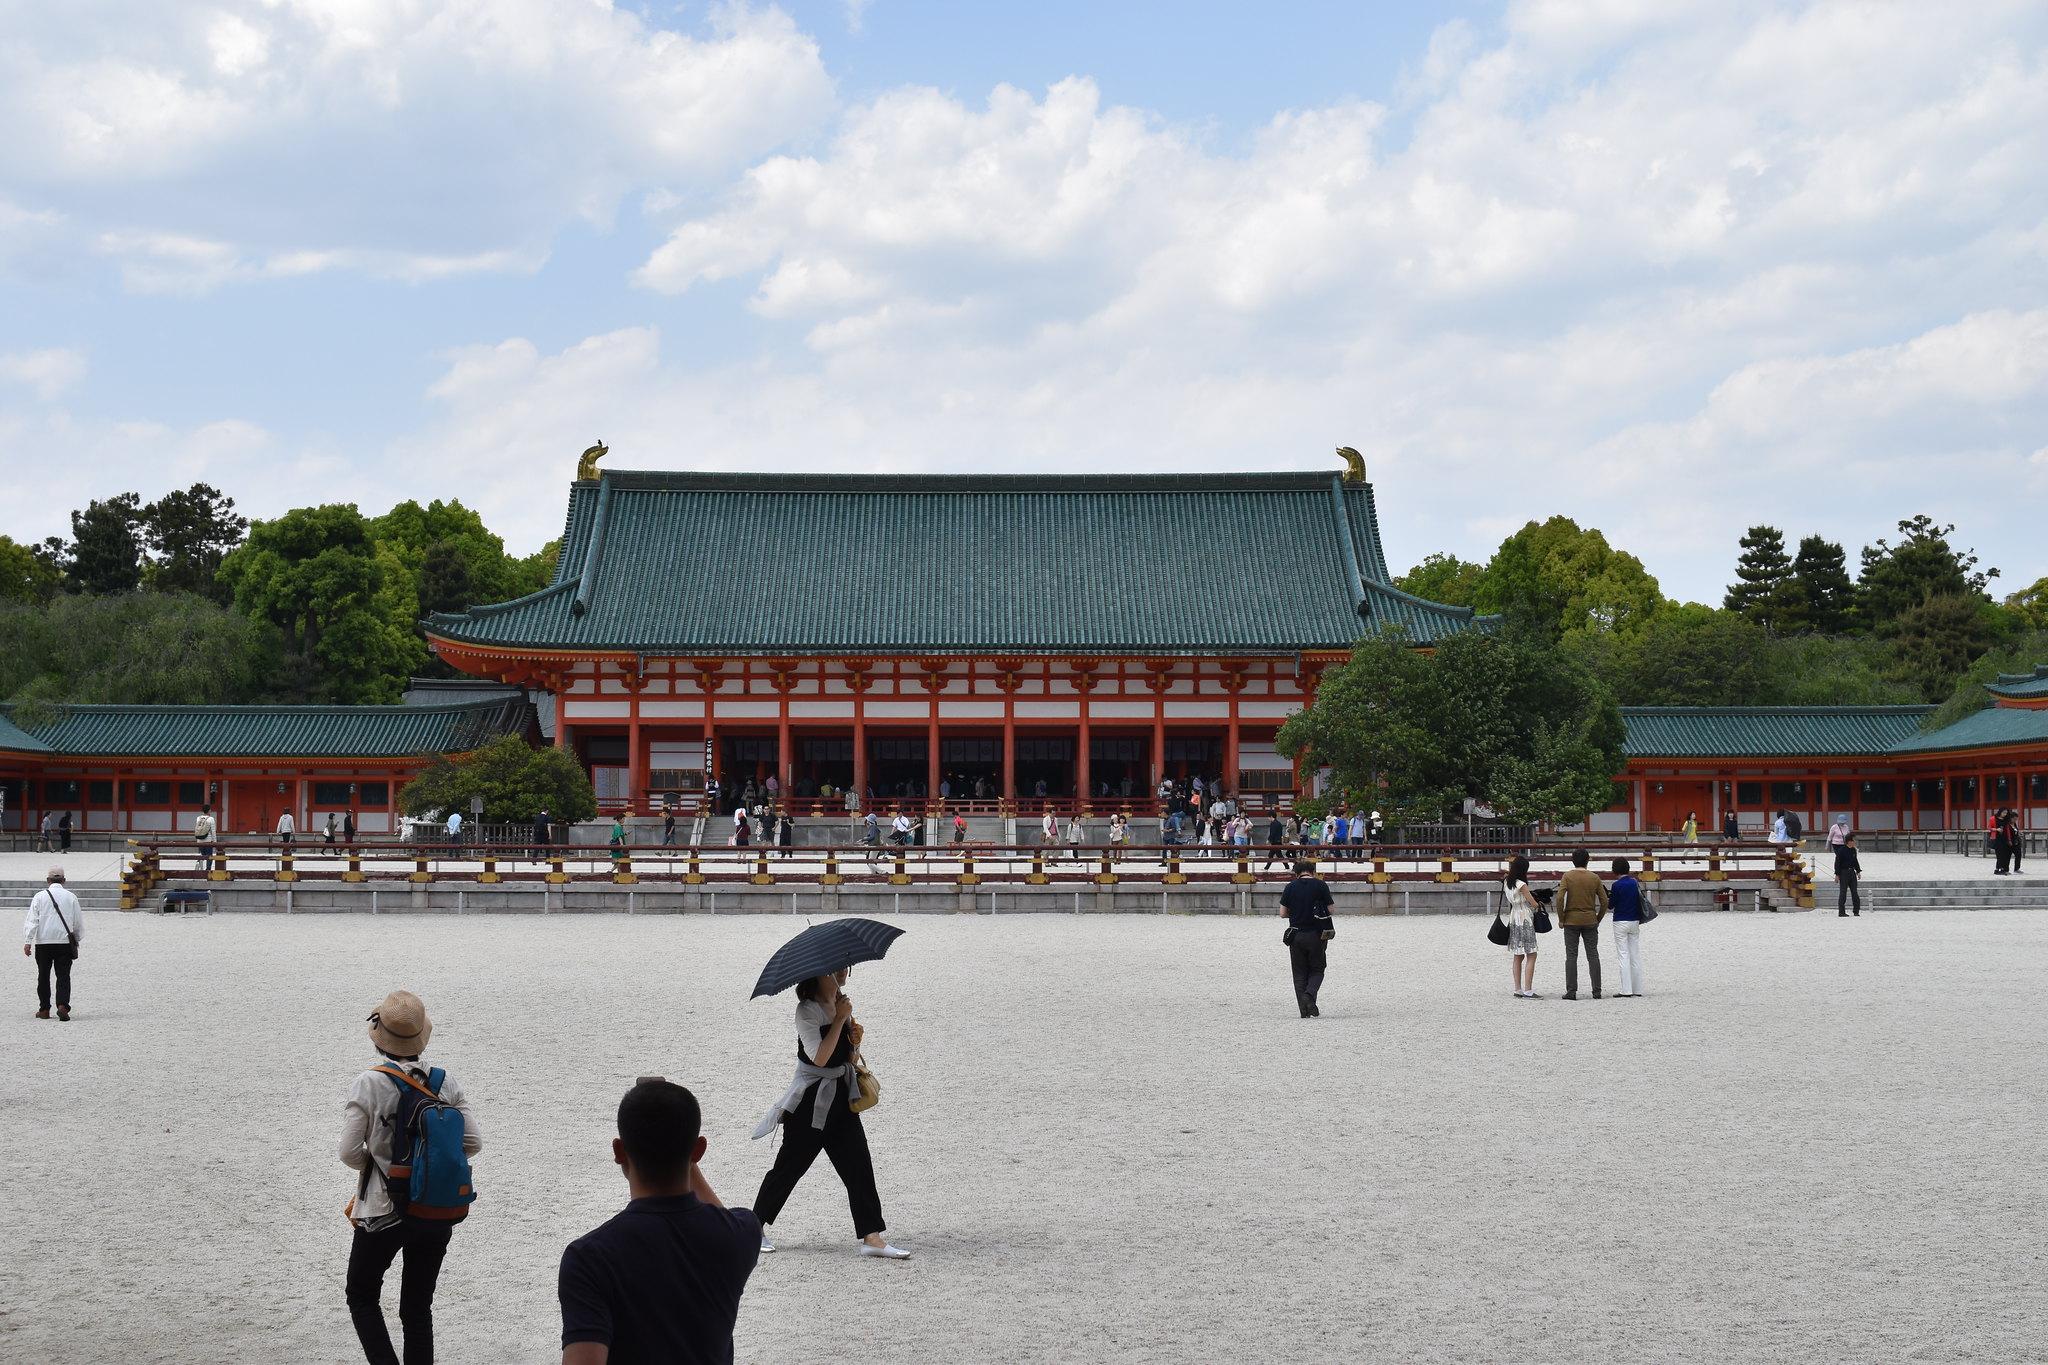 平安神宮(Heianjingu-shrine)